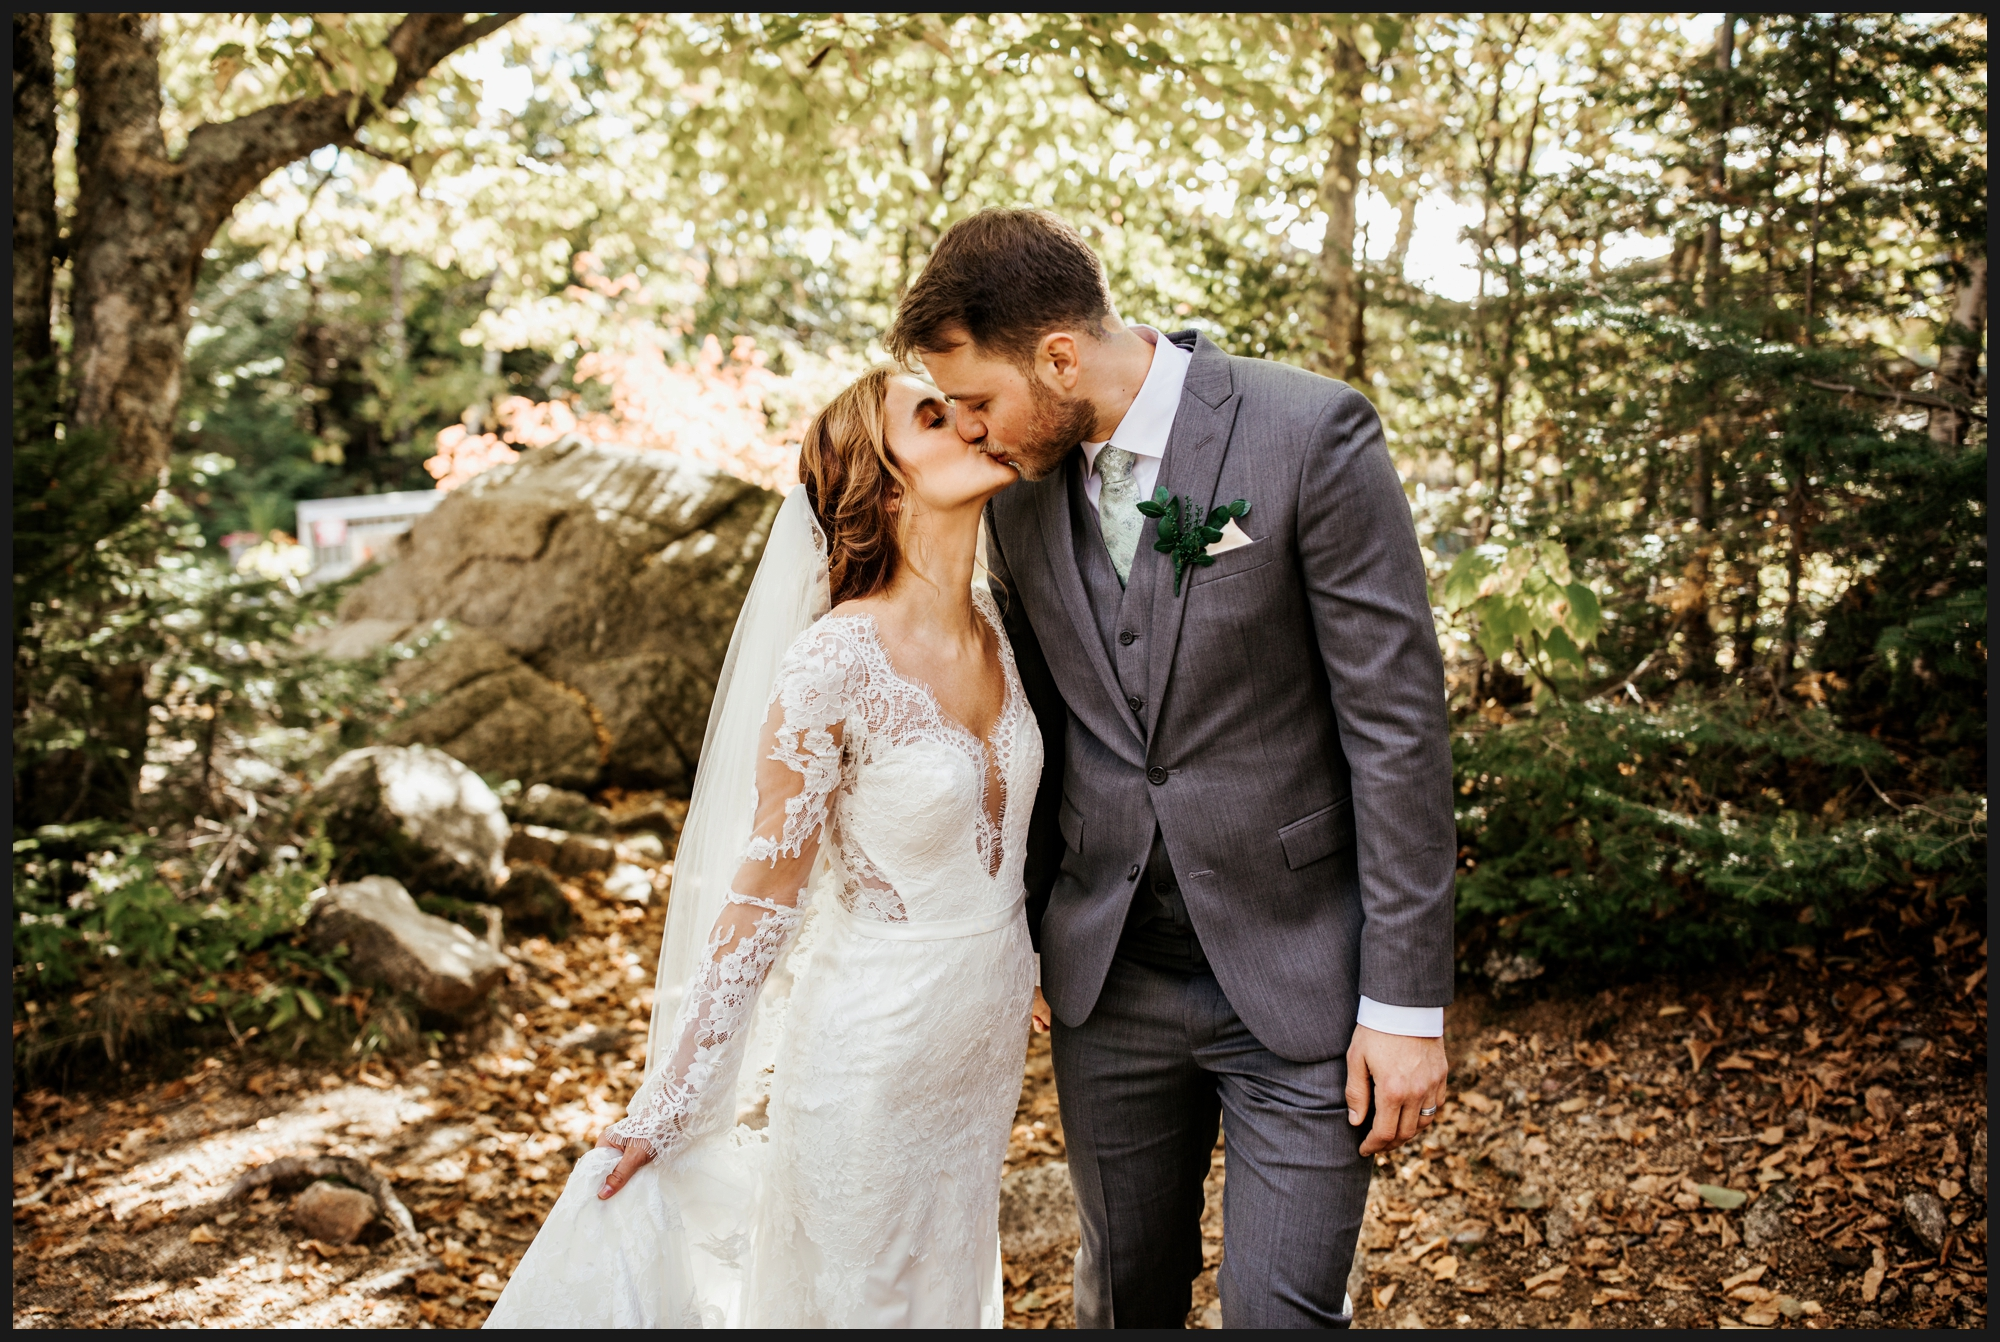 Orlando-Wedding-Photographer-destination-wedding-photographer-florida-wedding-photographer-hawaii-wedding-photographer_0115.jpg